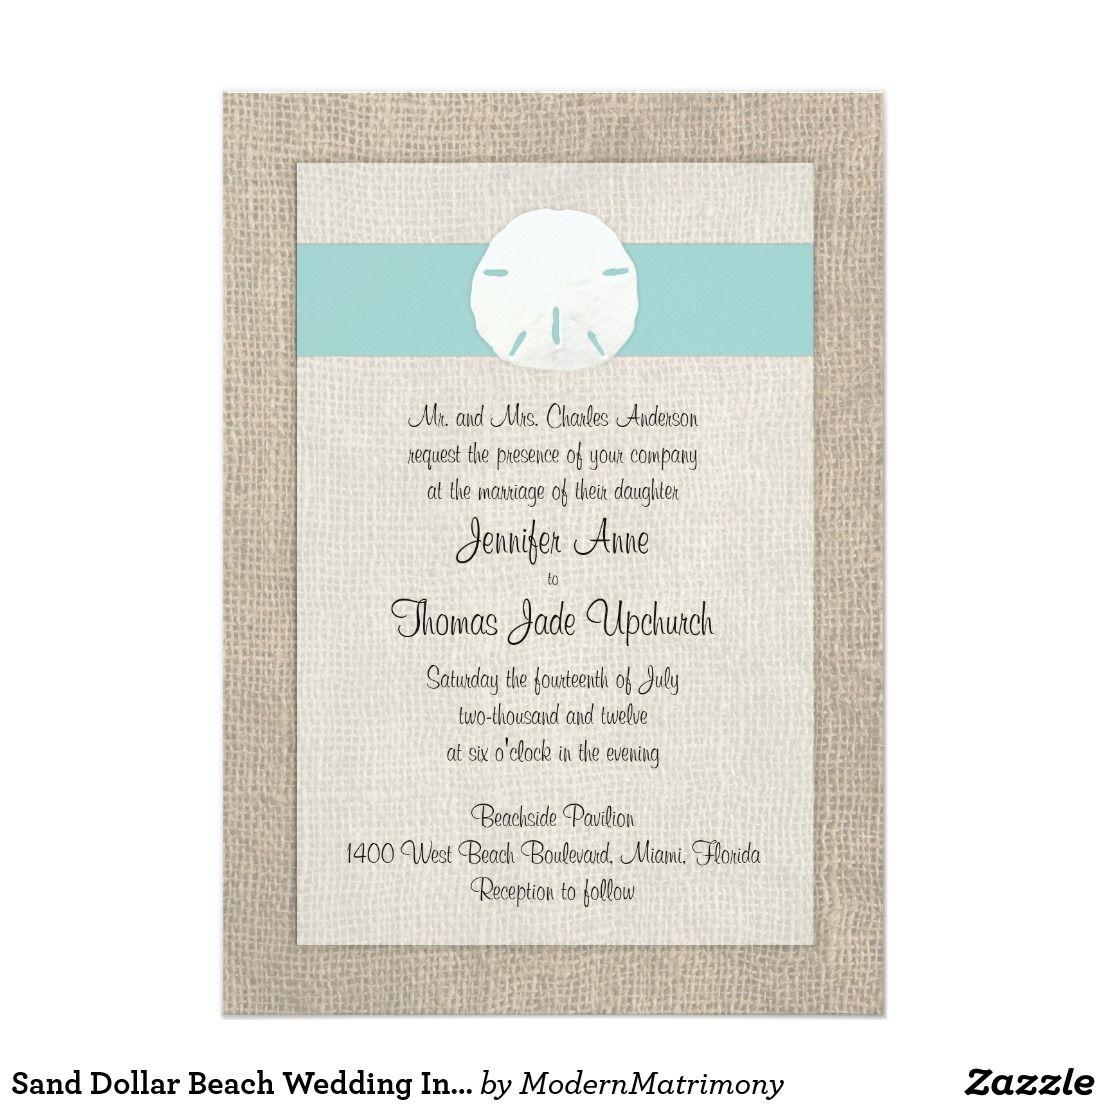 Sand Dollar Beach Wedding Invitation - Turquoise | Beach Wedding ...